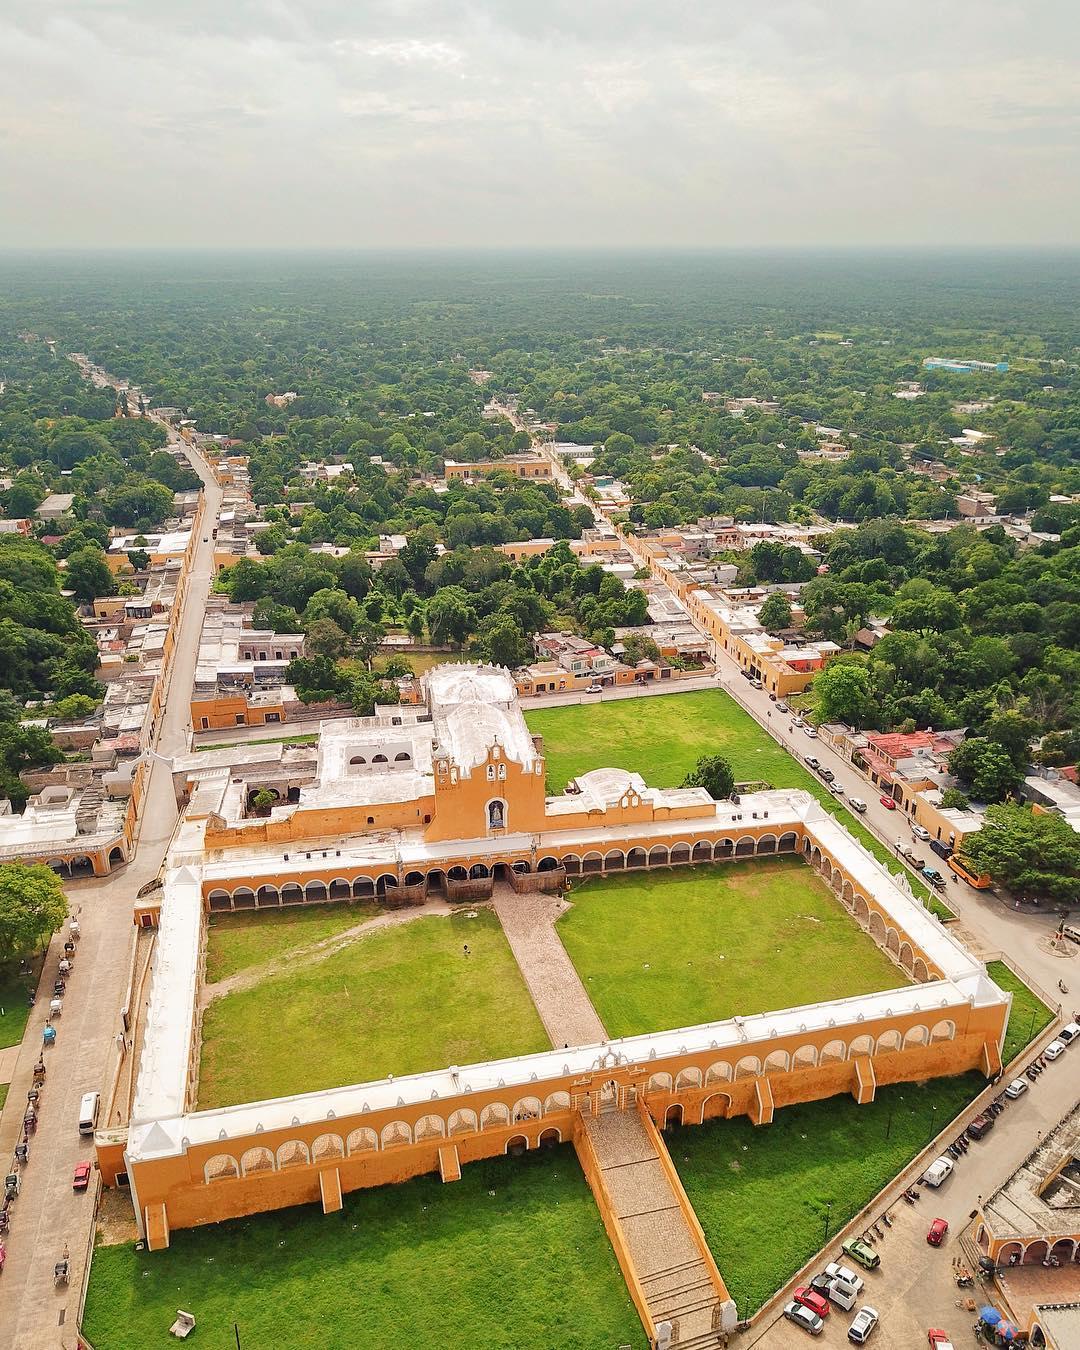 Iglesia de izamal yucatan, convento san antonio padua, top iglesias yucatan, yucatan churches